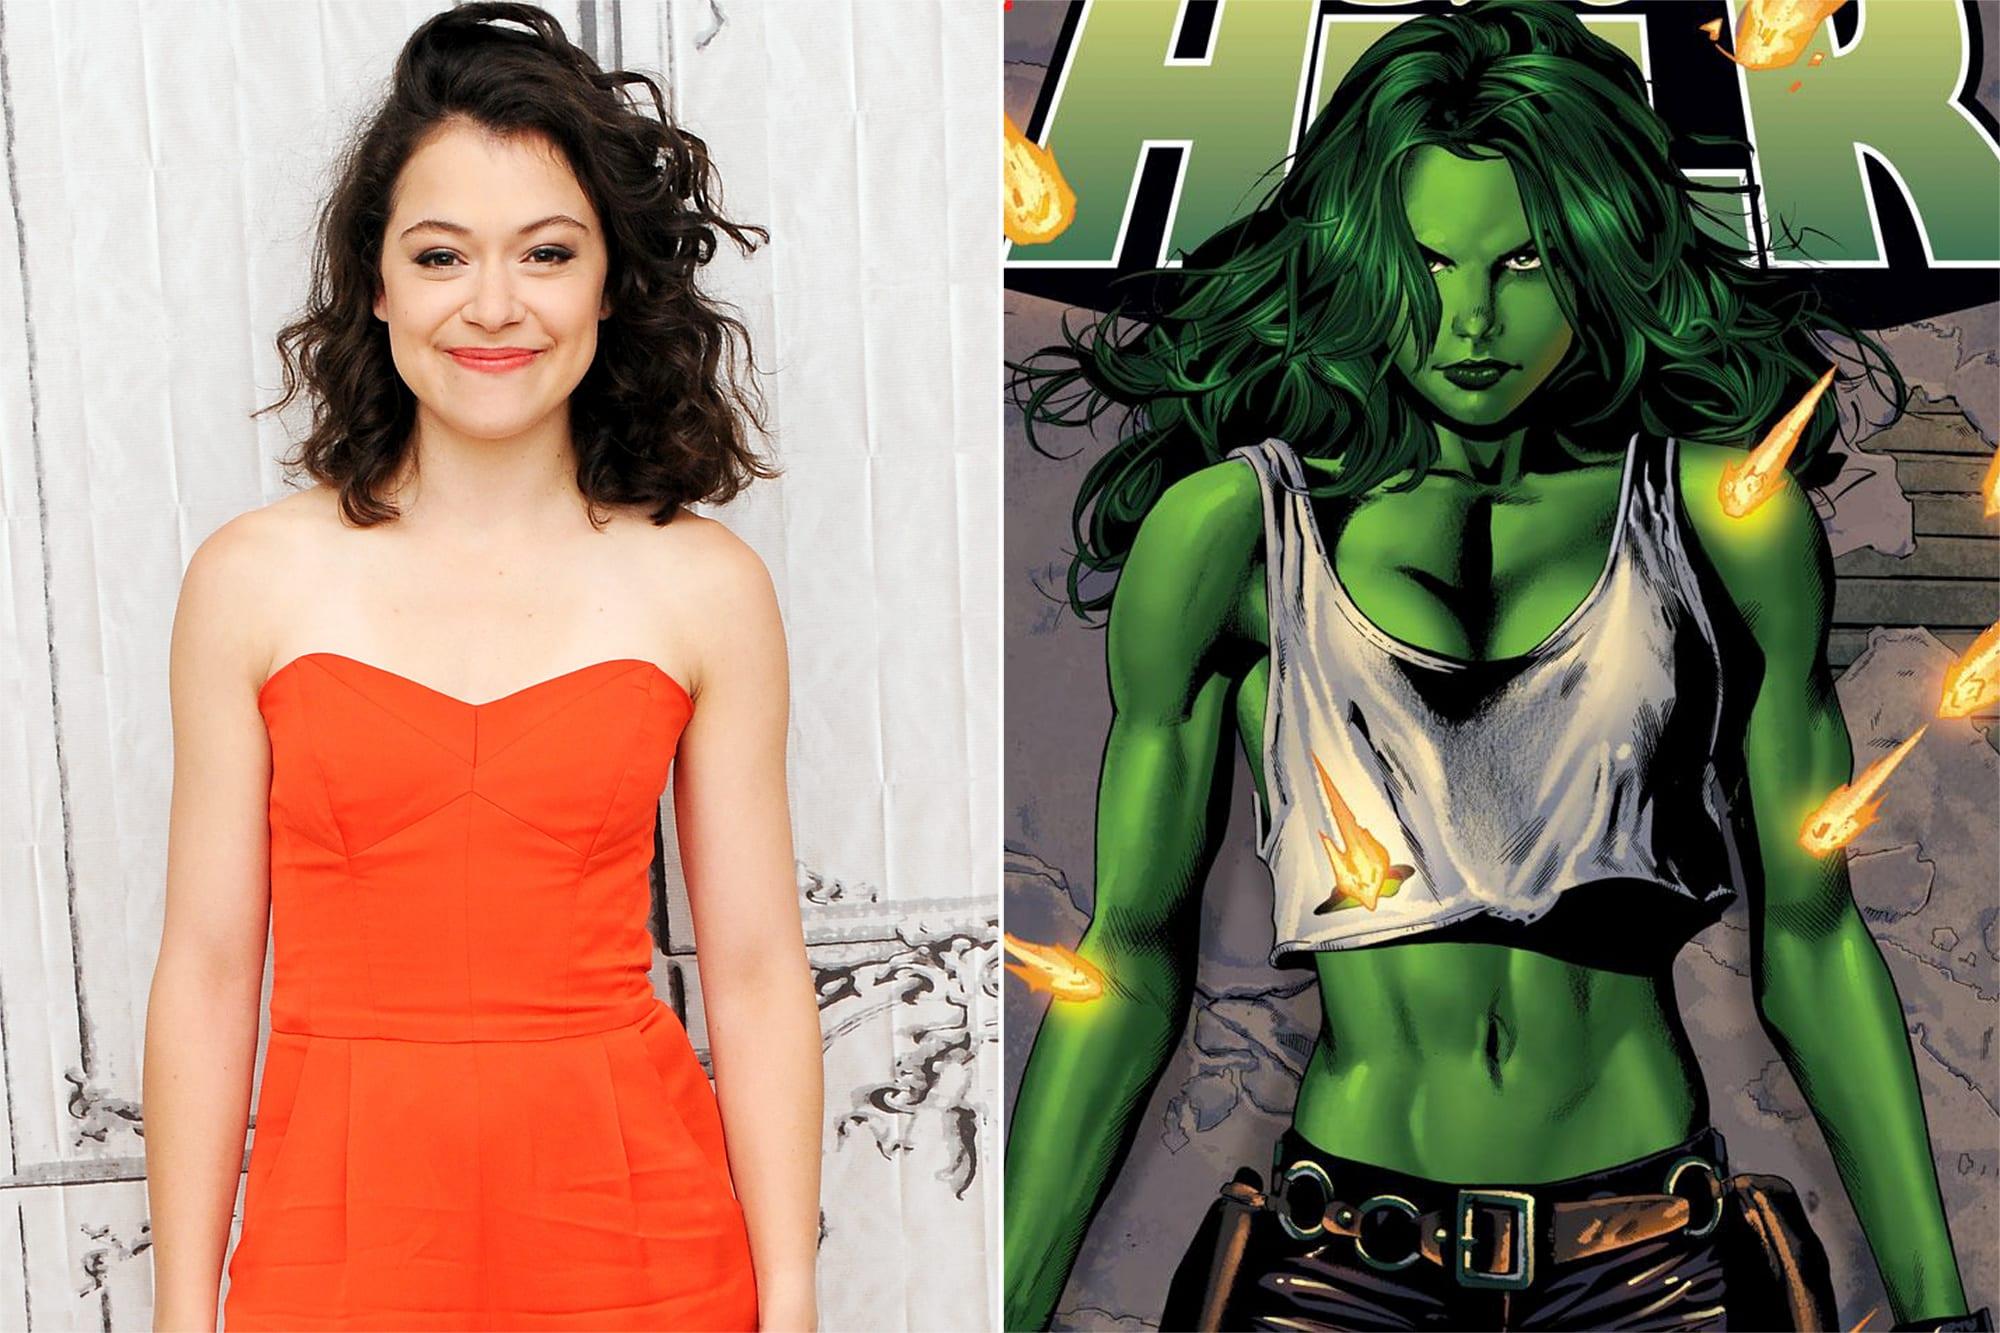 She-Hulk: Tatiana Maslany sarà la protagonista della serie TV